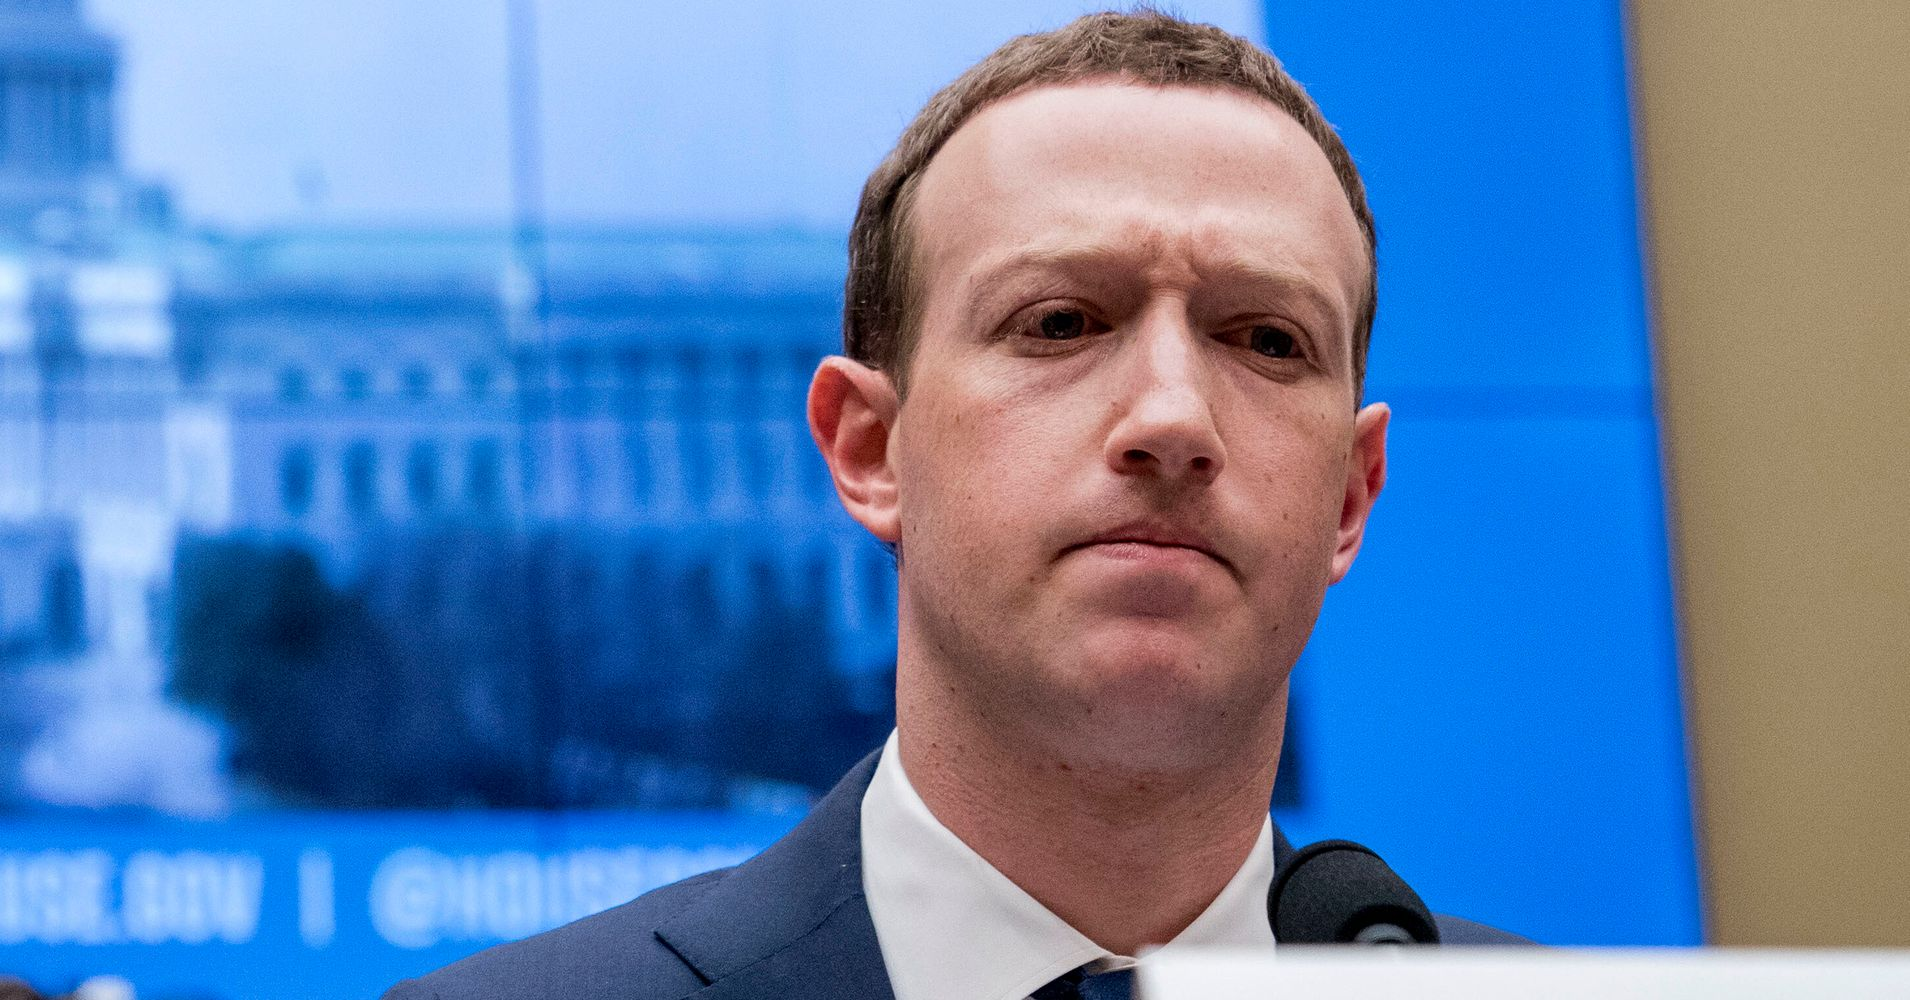 Westlake Legal Group 5d28f1ec26000050000444eb Federal Trade Commission Approves $5 Billion Fine For Facebook: Report